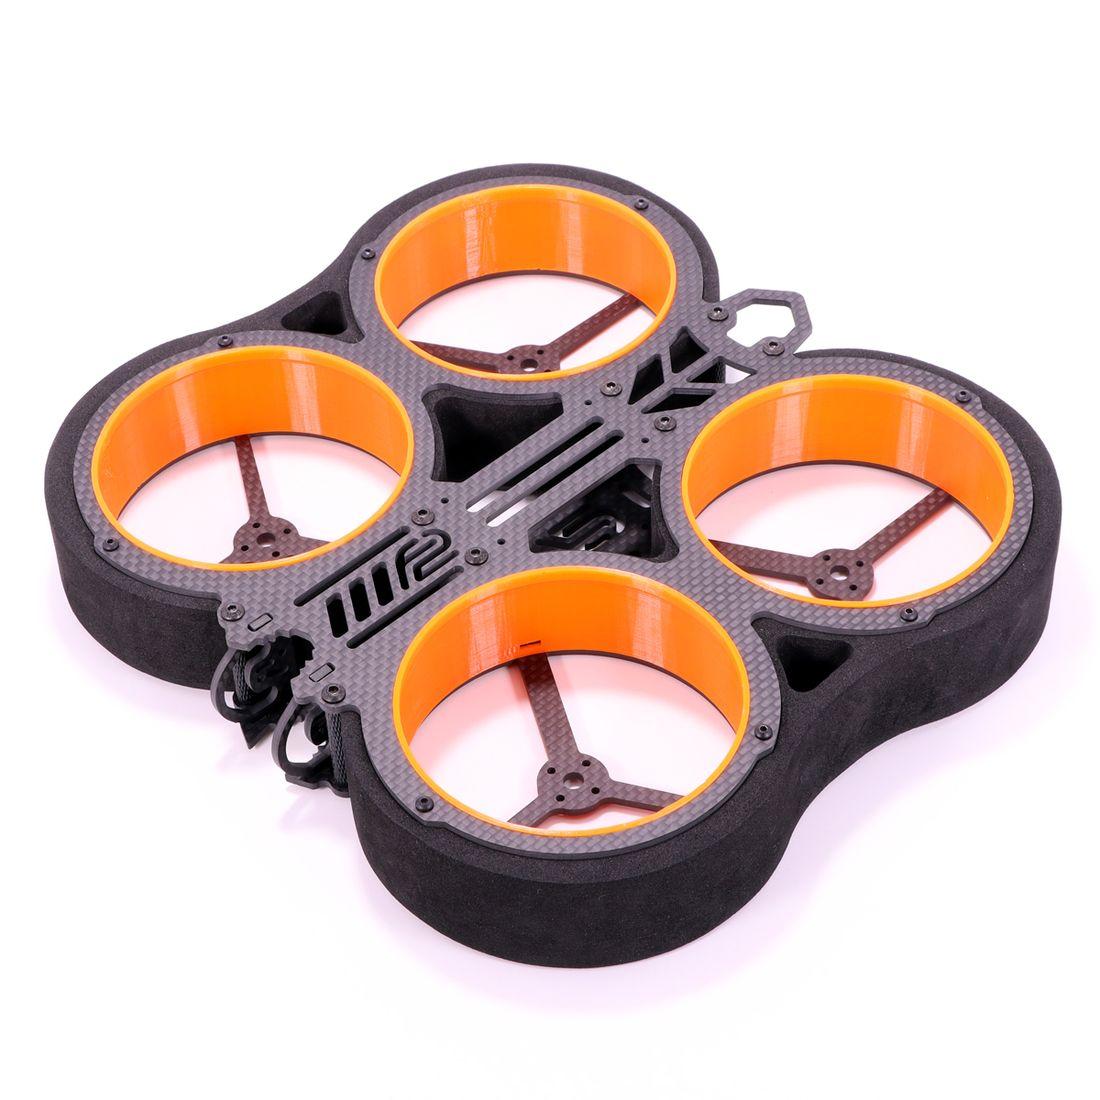 Feichao kit de rack para drone, kit de rack para alfarc f2 cineboy 3 Polegada, cinewhoop rc, quadricóptero de corrida uav multifuncional rotor